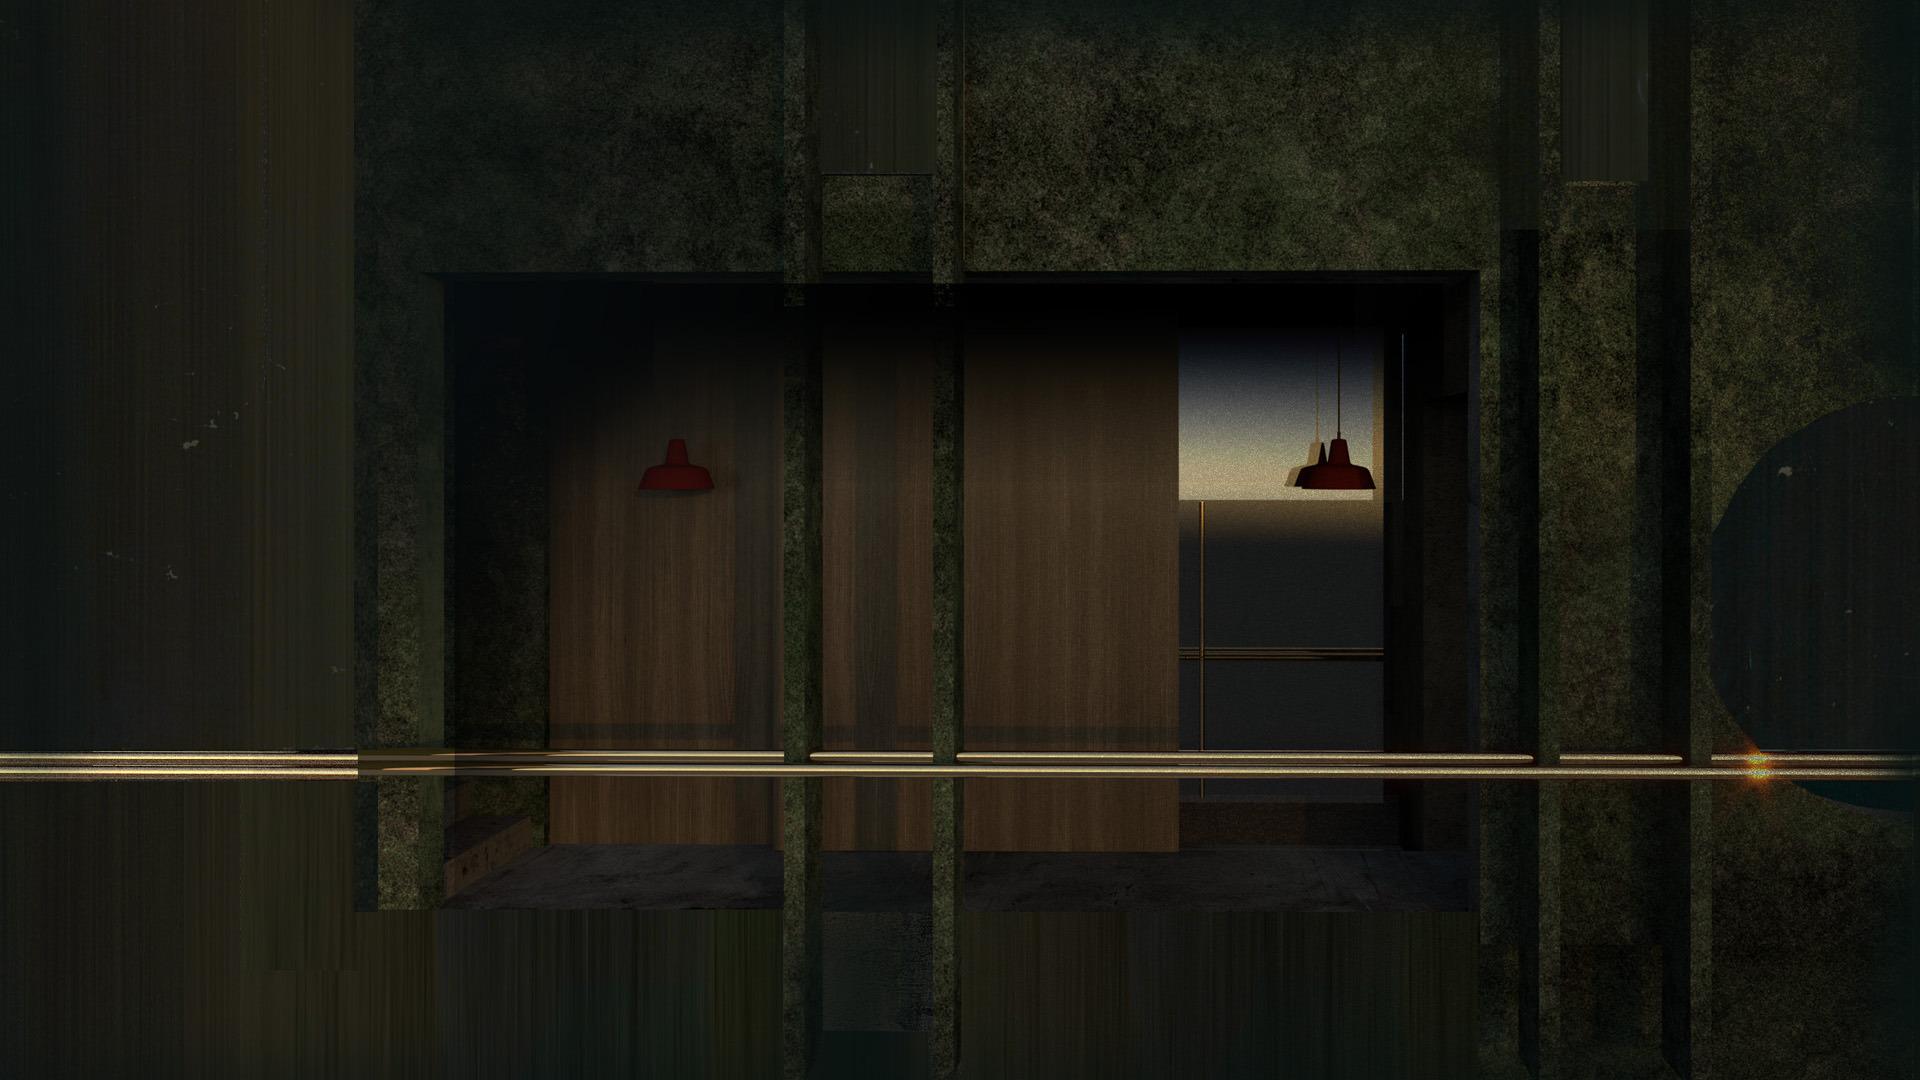 Dwelling II / Room for Light